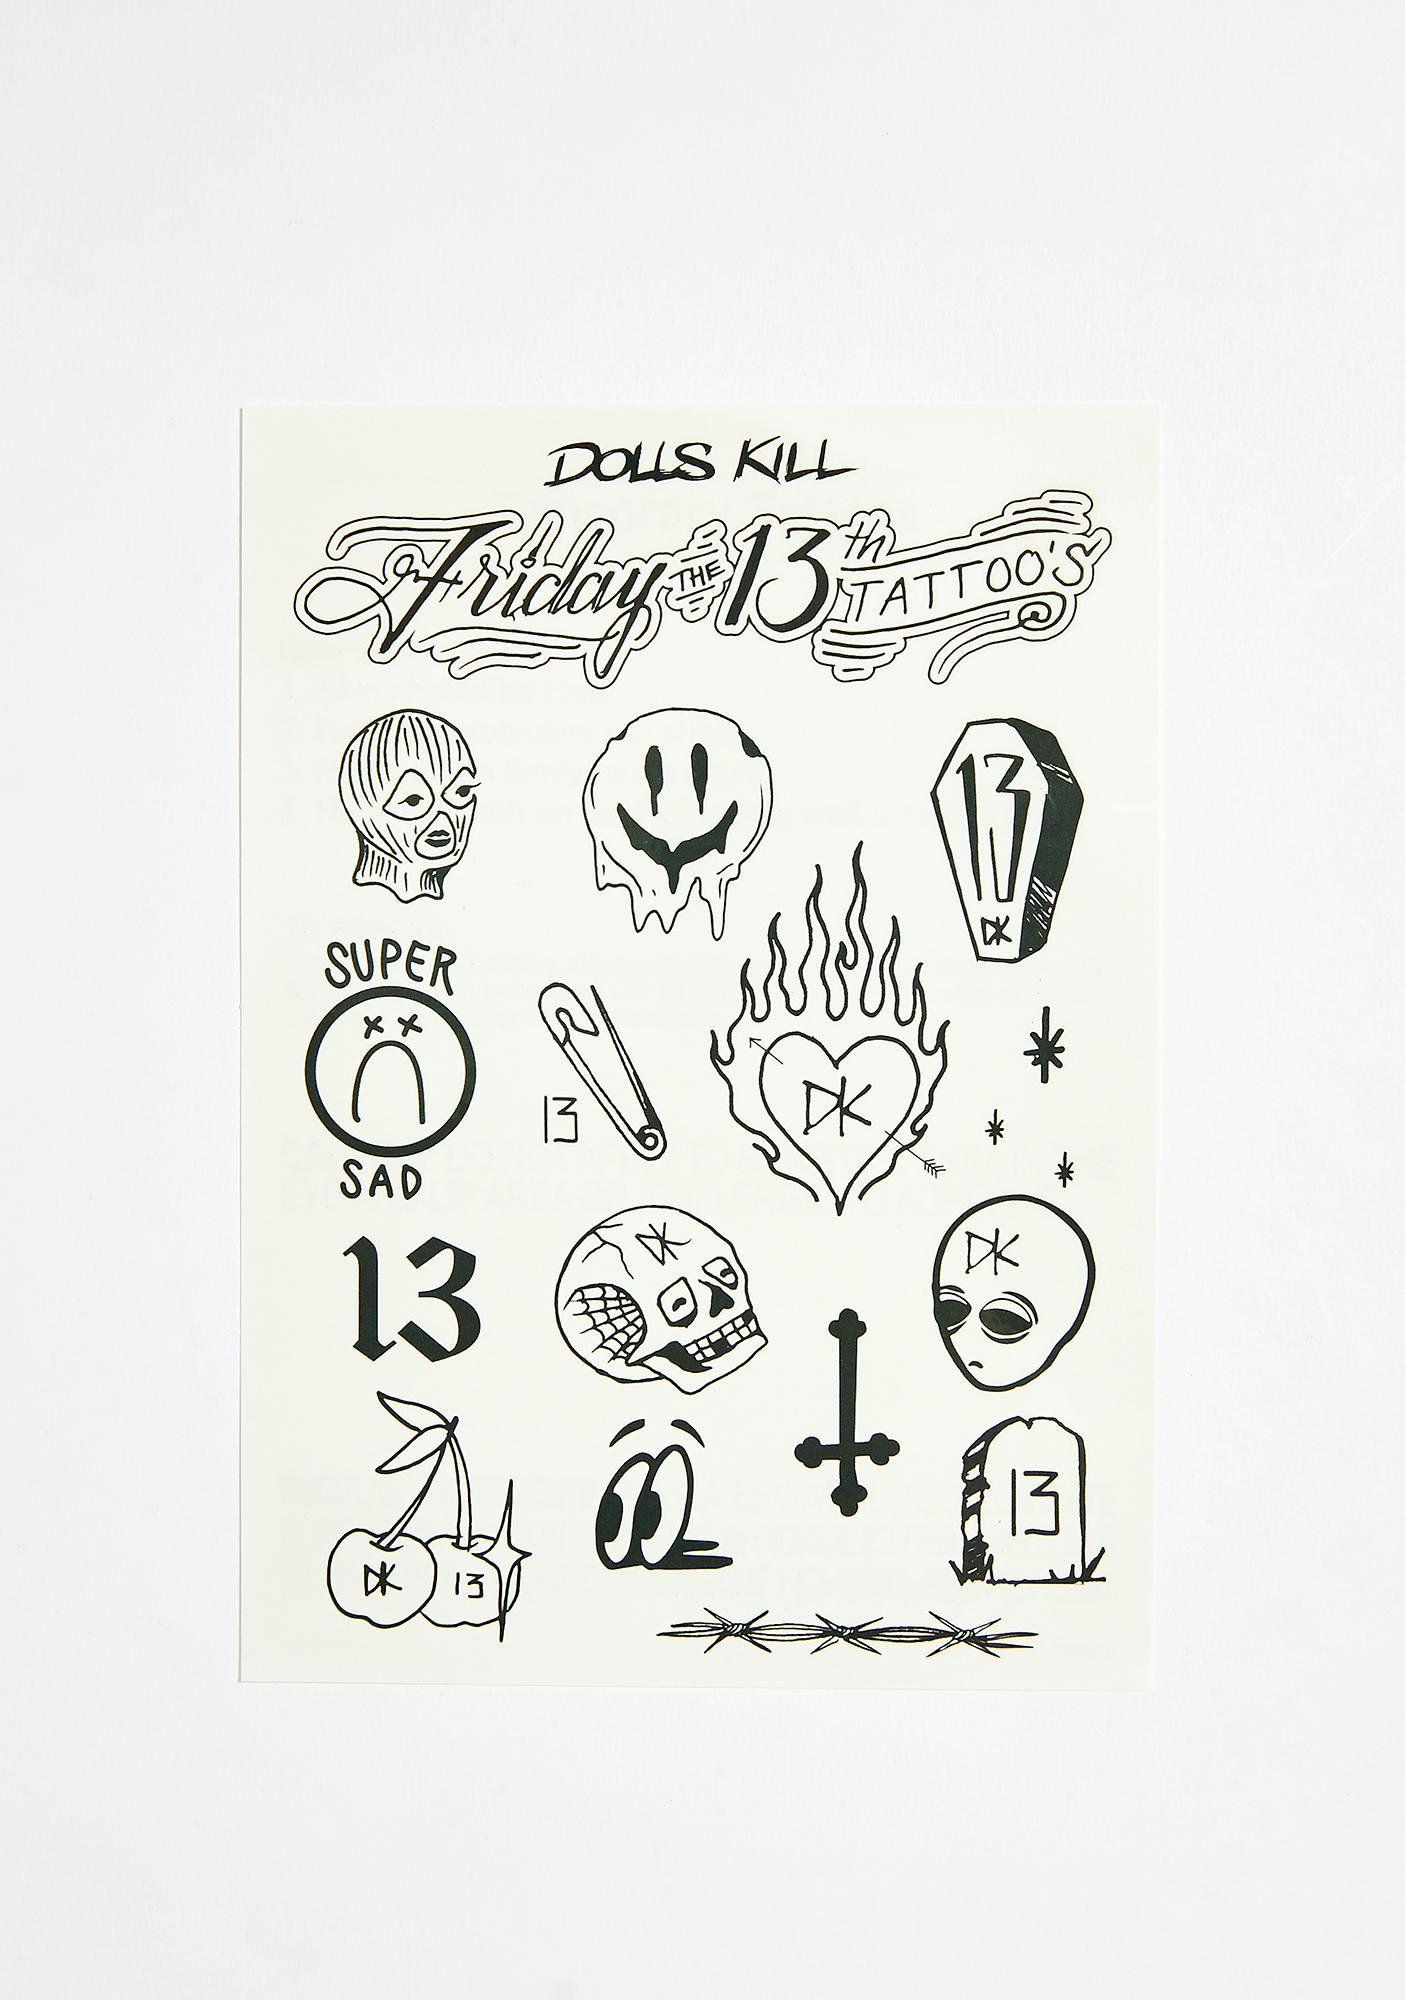 Friday The 13th Flash Tattoos